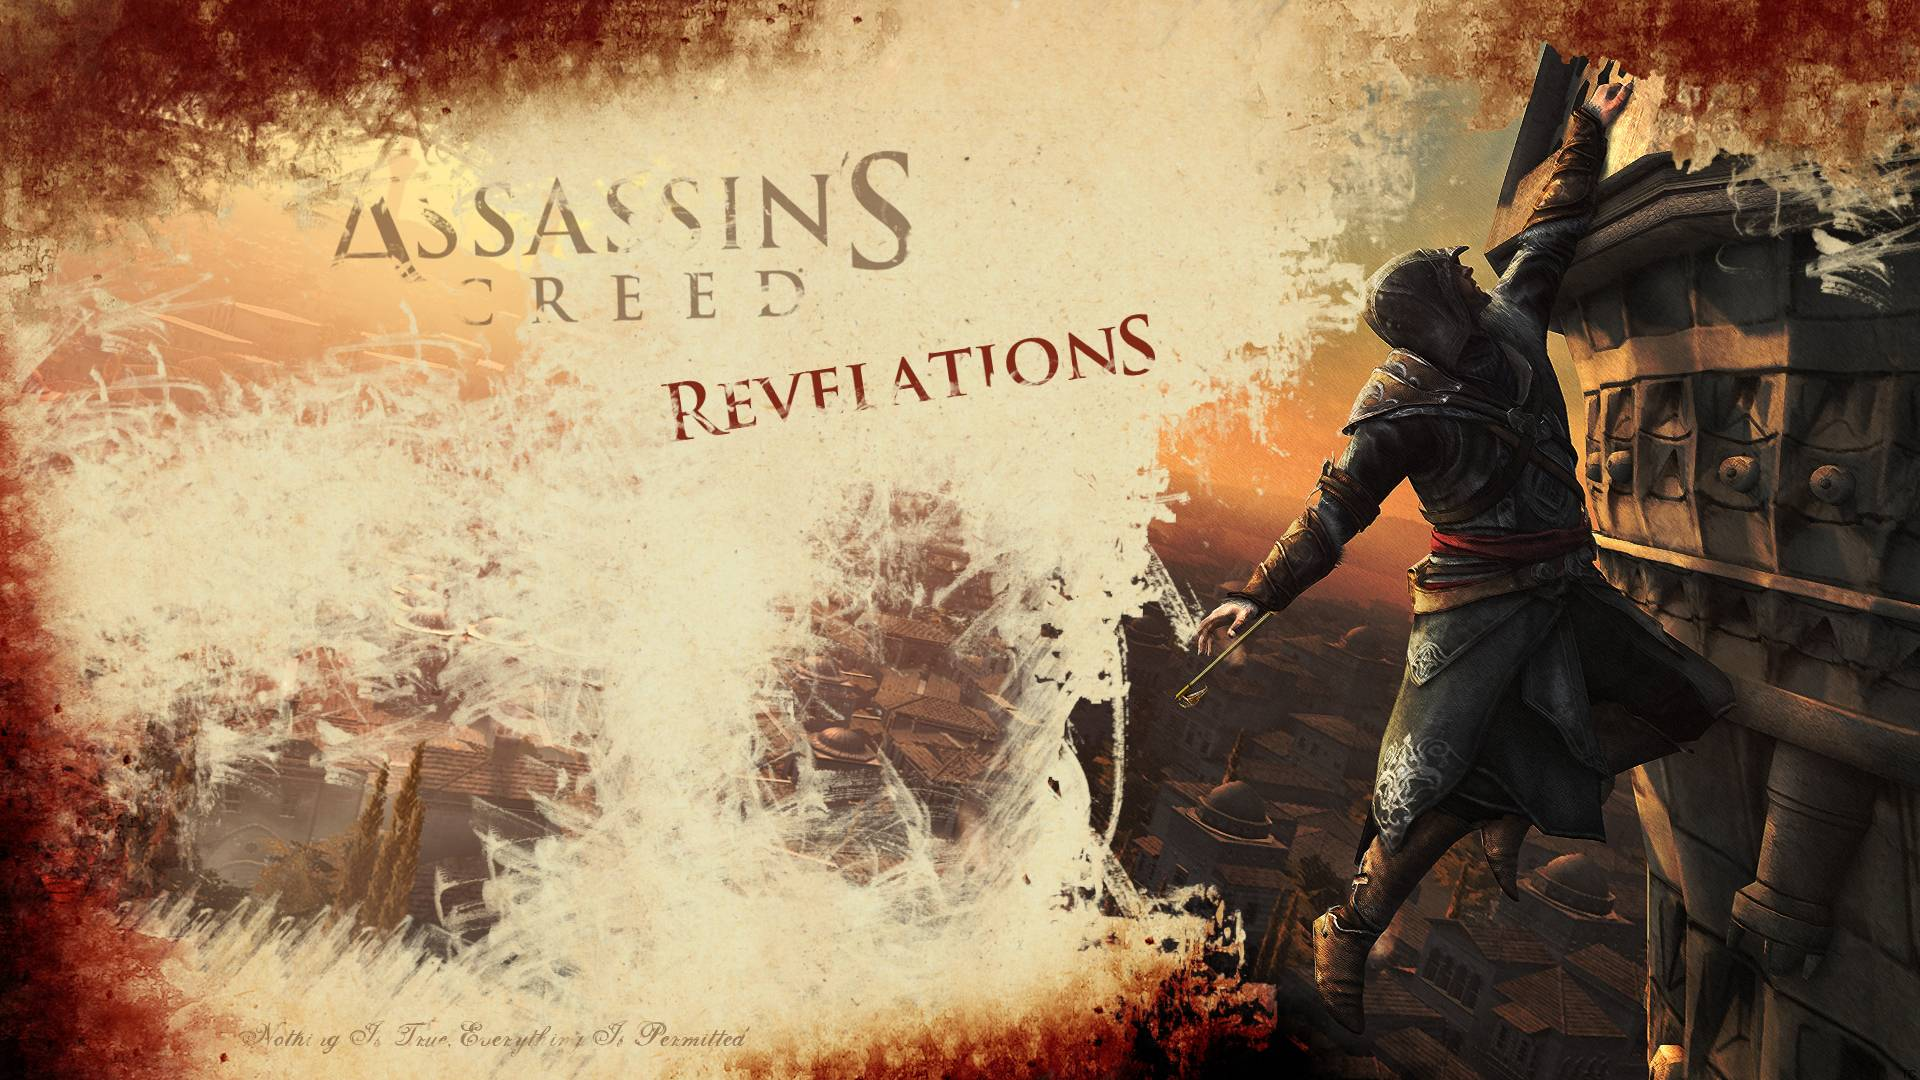 assassins creedersassassins creed revelations wallpaper hdjpg 1920x1080